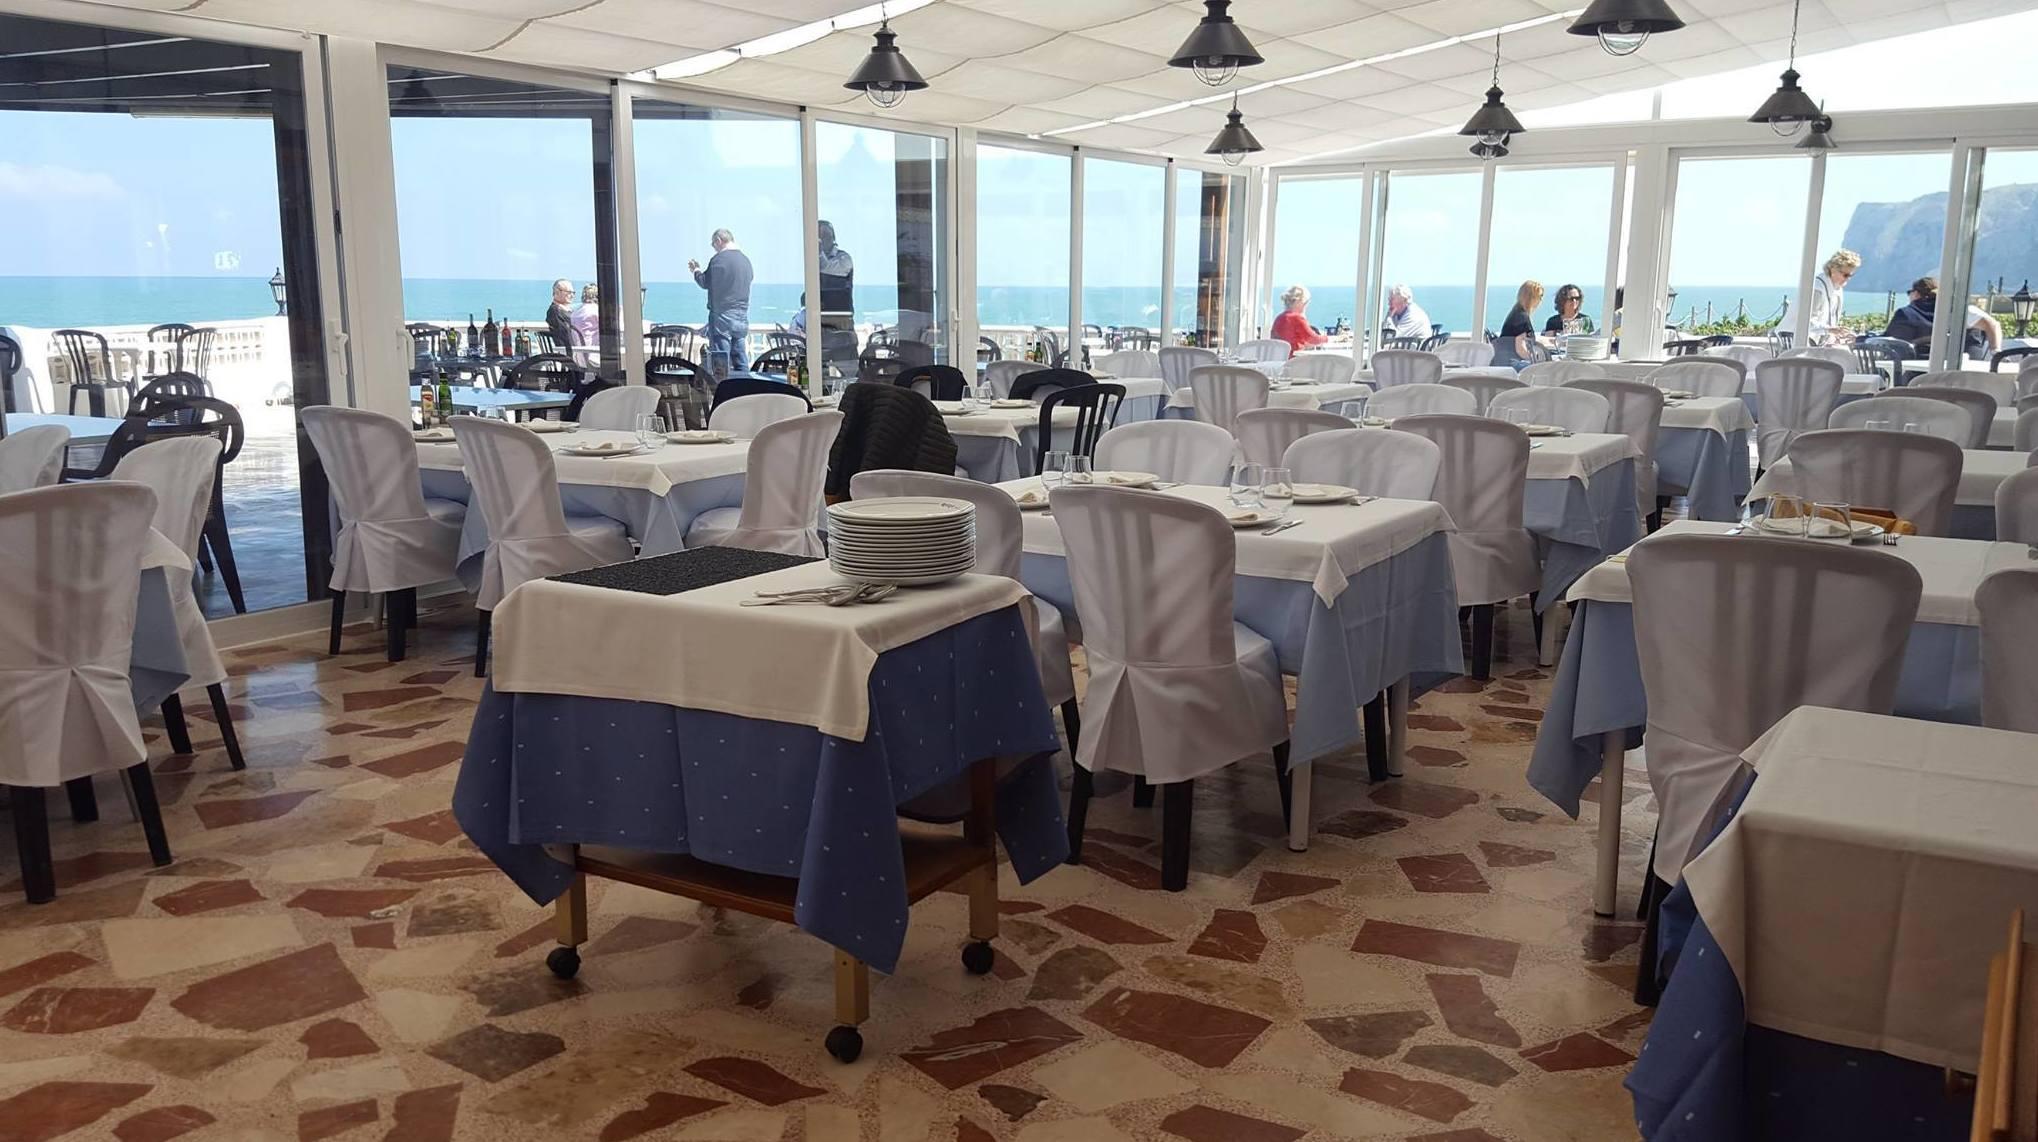 Mejor restaurante en Denia|Restaurante Mena